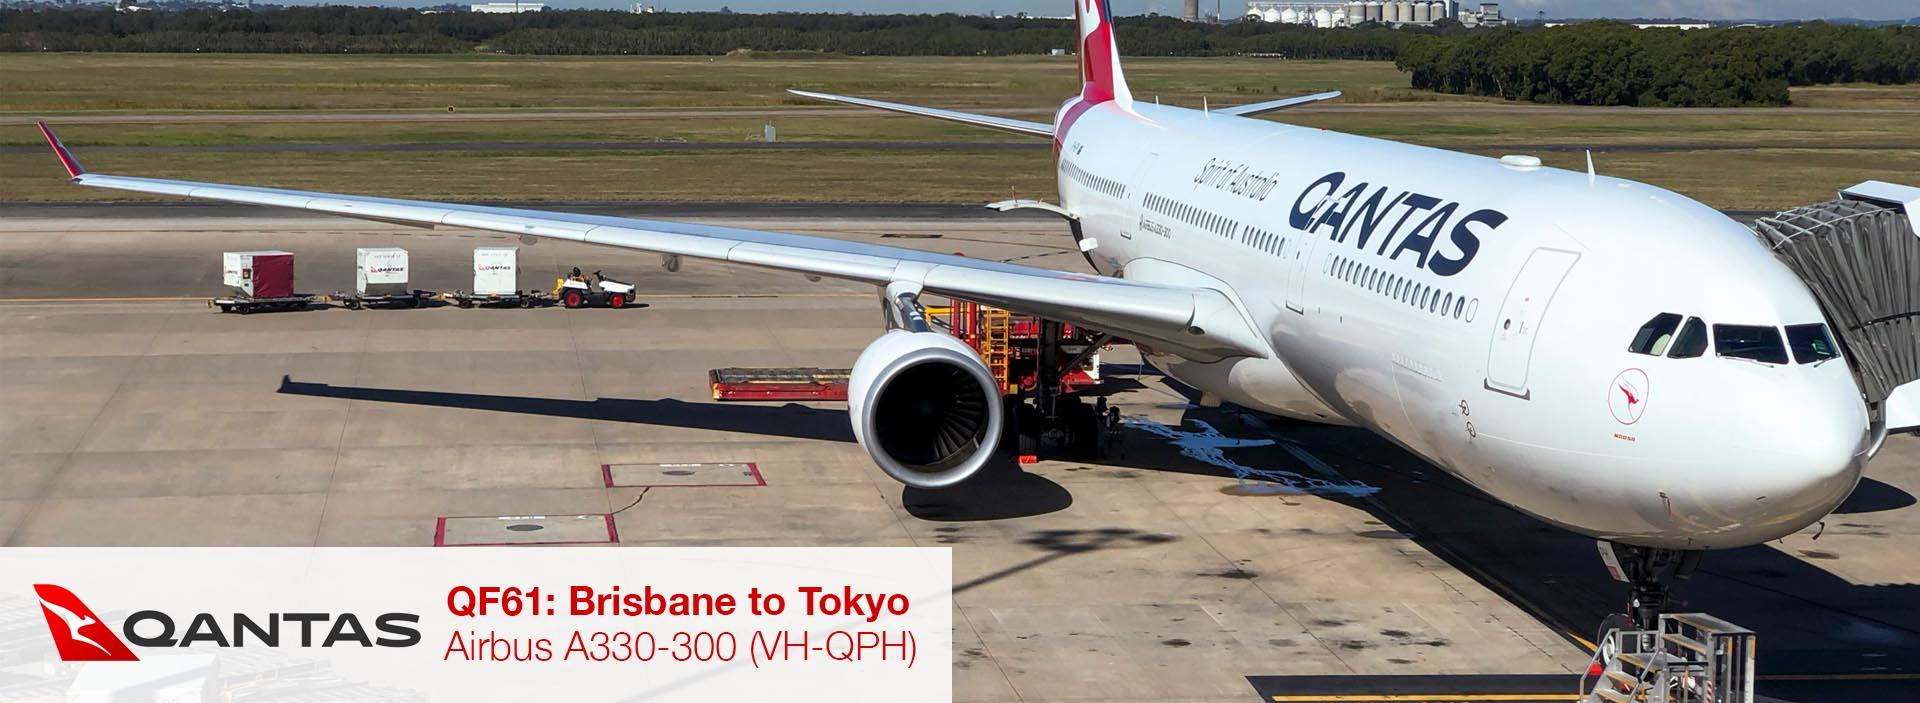 Flight Review: Qantas A330-300 Economy Class from Brisbane to Tokyo Narita